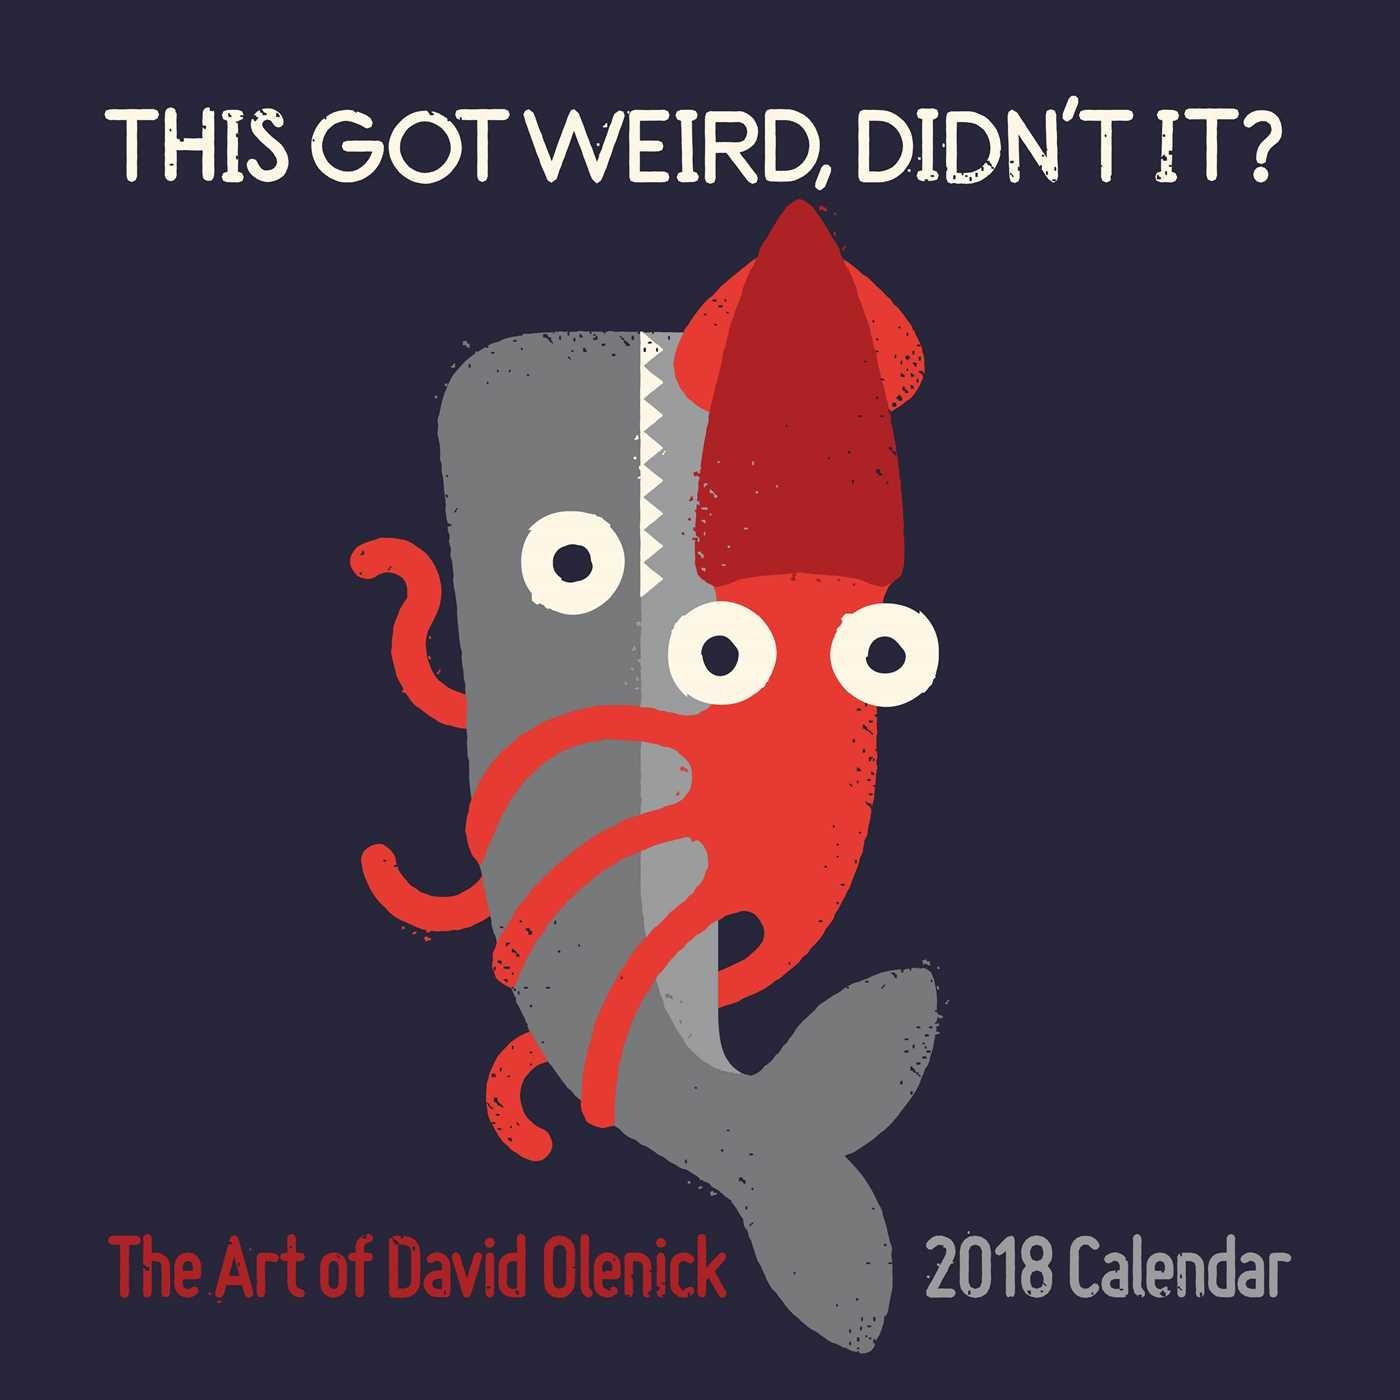 The Art of David Olenick 2018 Wall Calendar: This Got Weird, Didn't It?: David  Olenick: 0050837360280: Amazon.com: Books